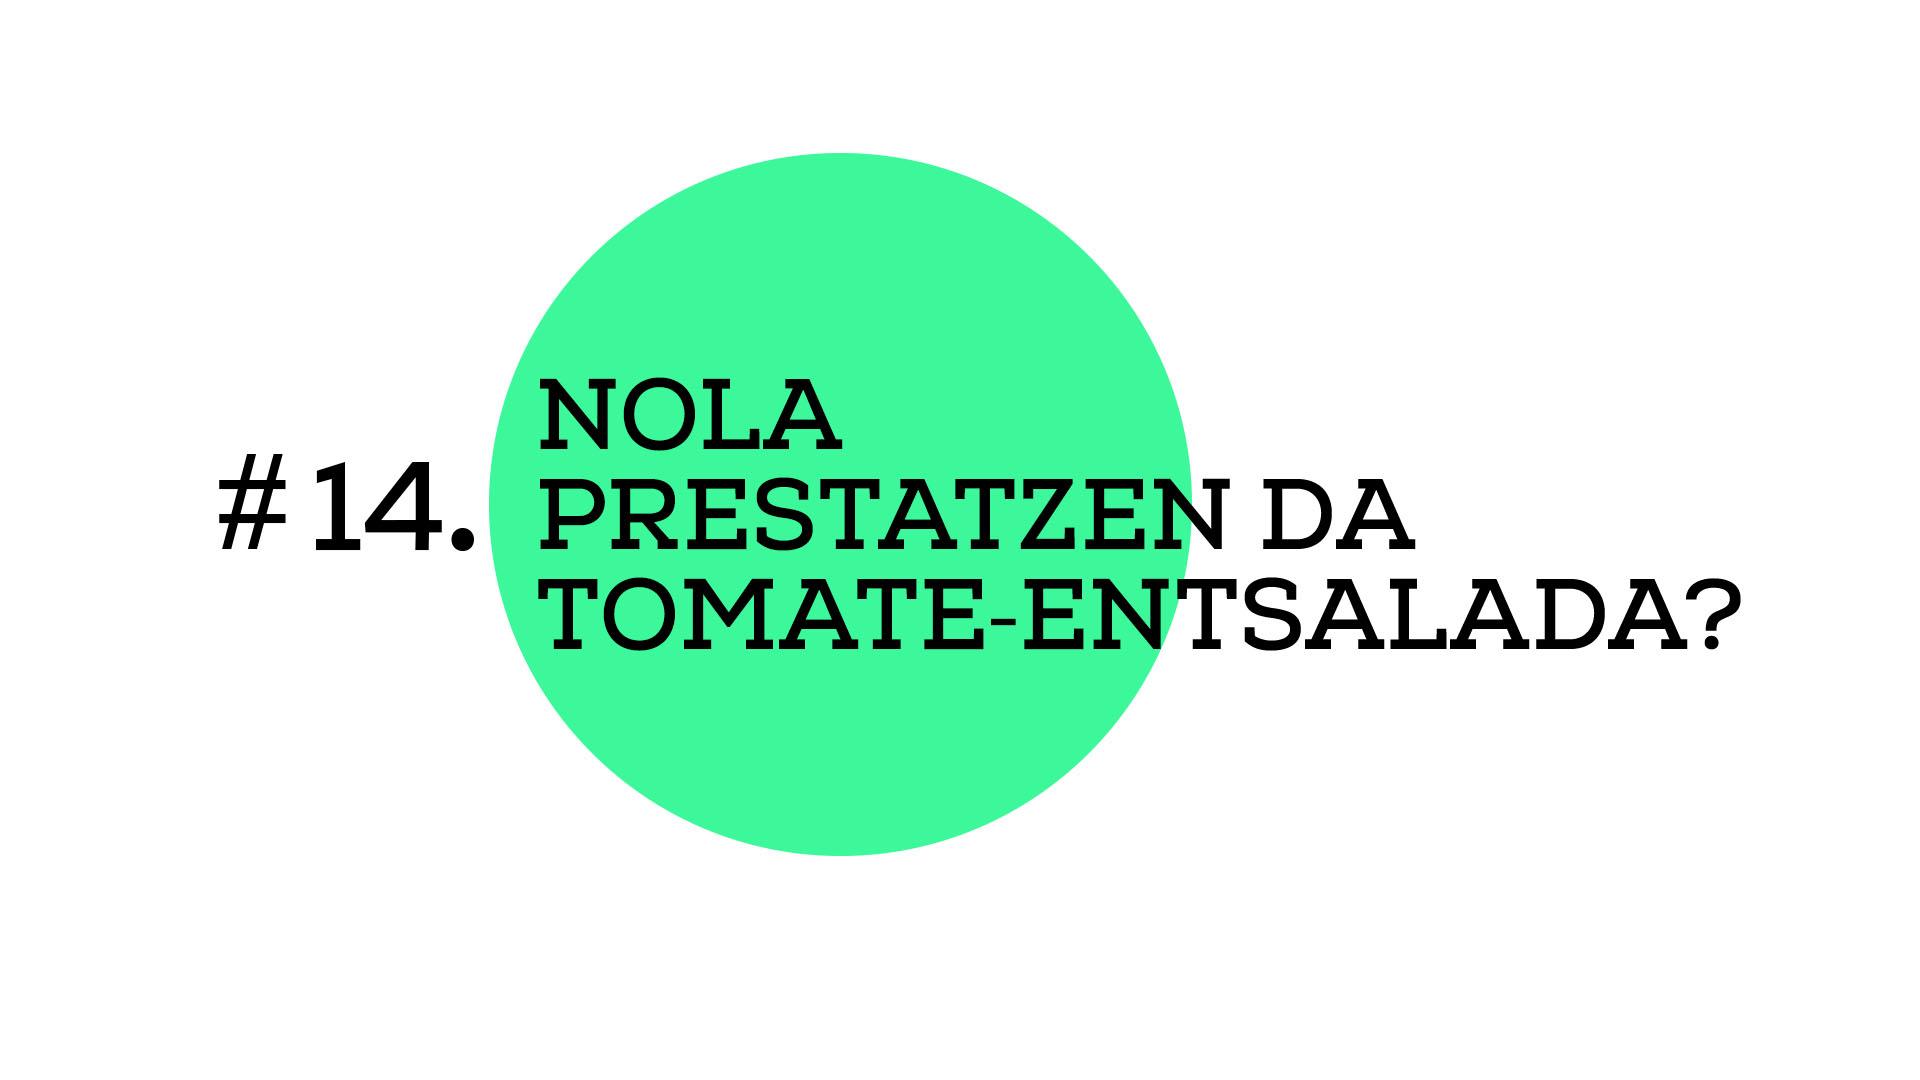 Nola prestatzen da tomate-entsalada? (A1E14)